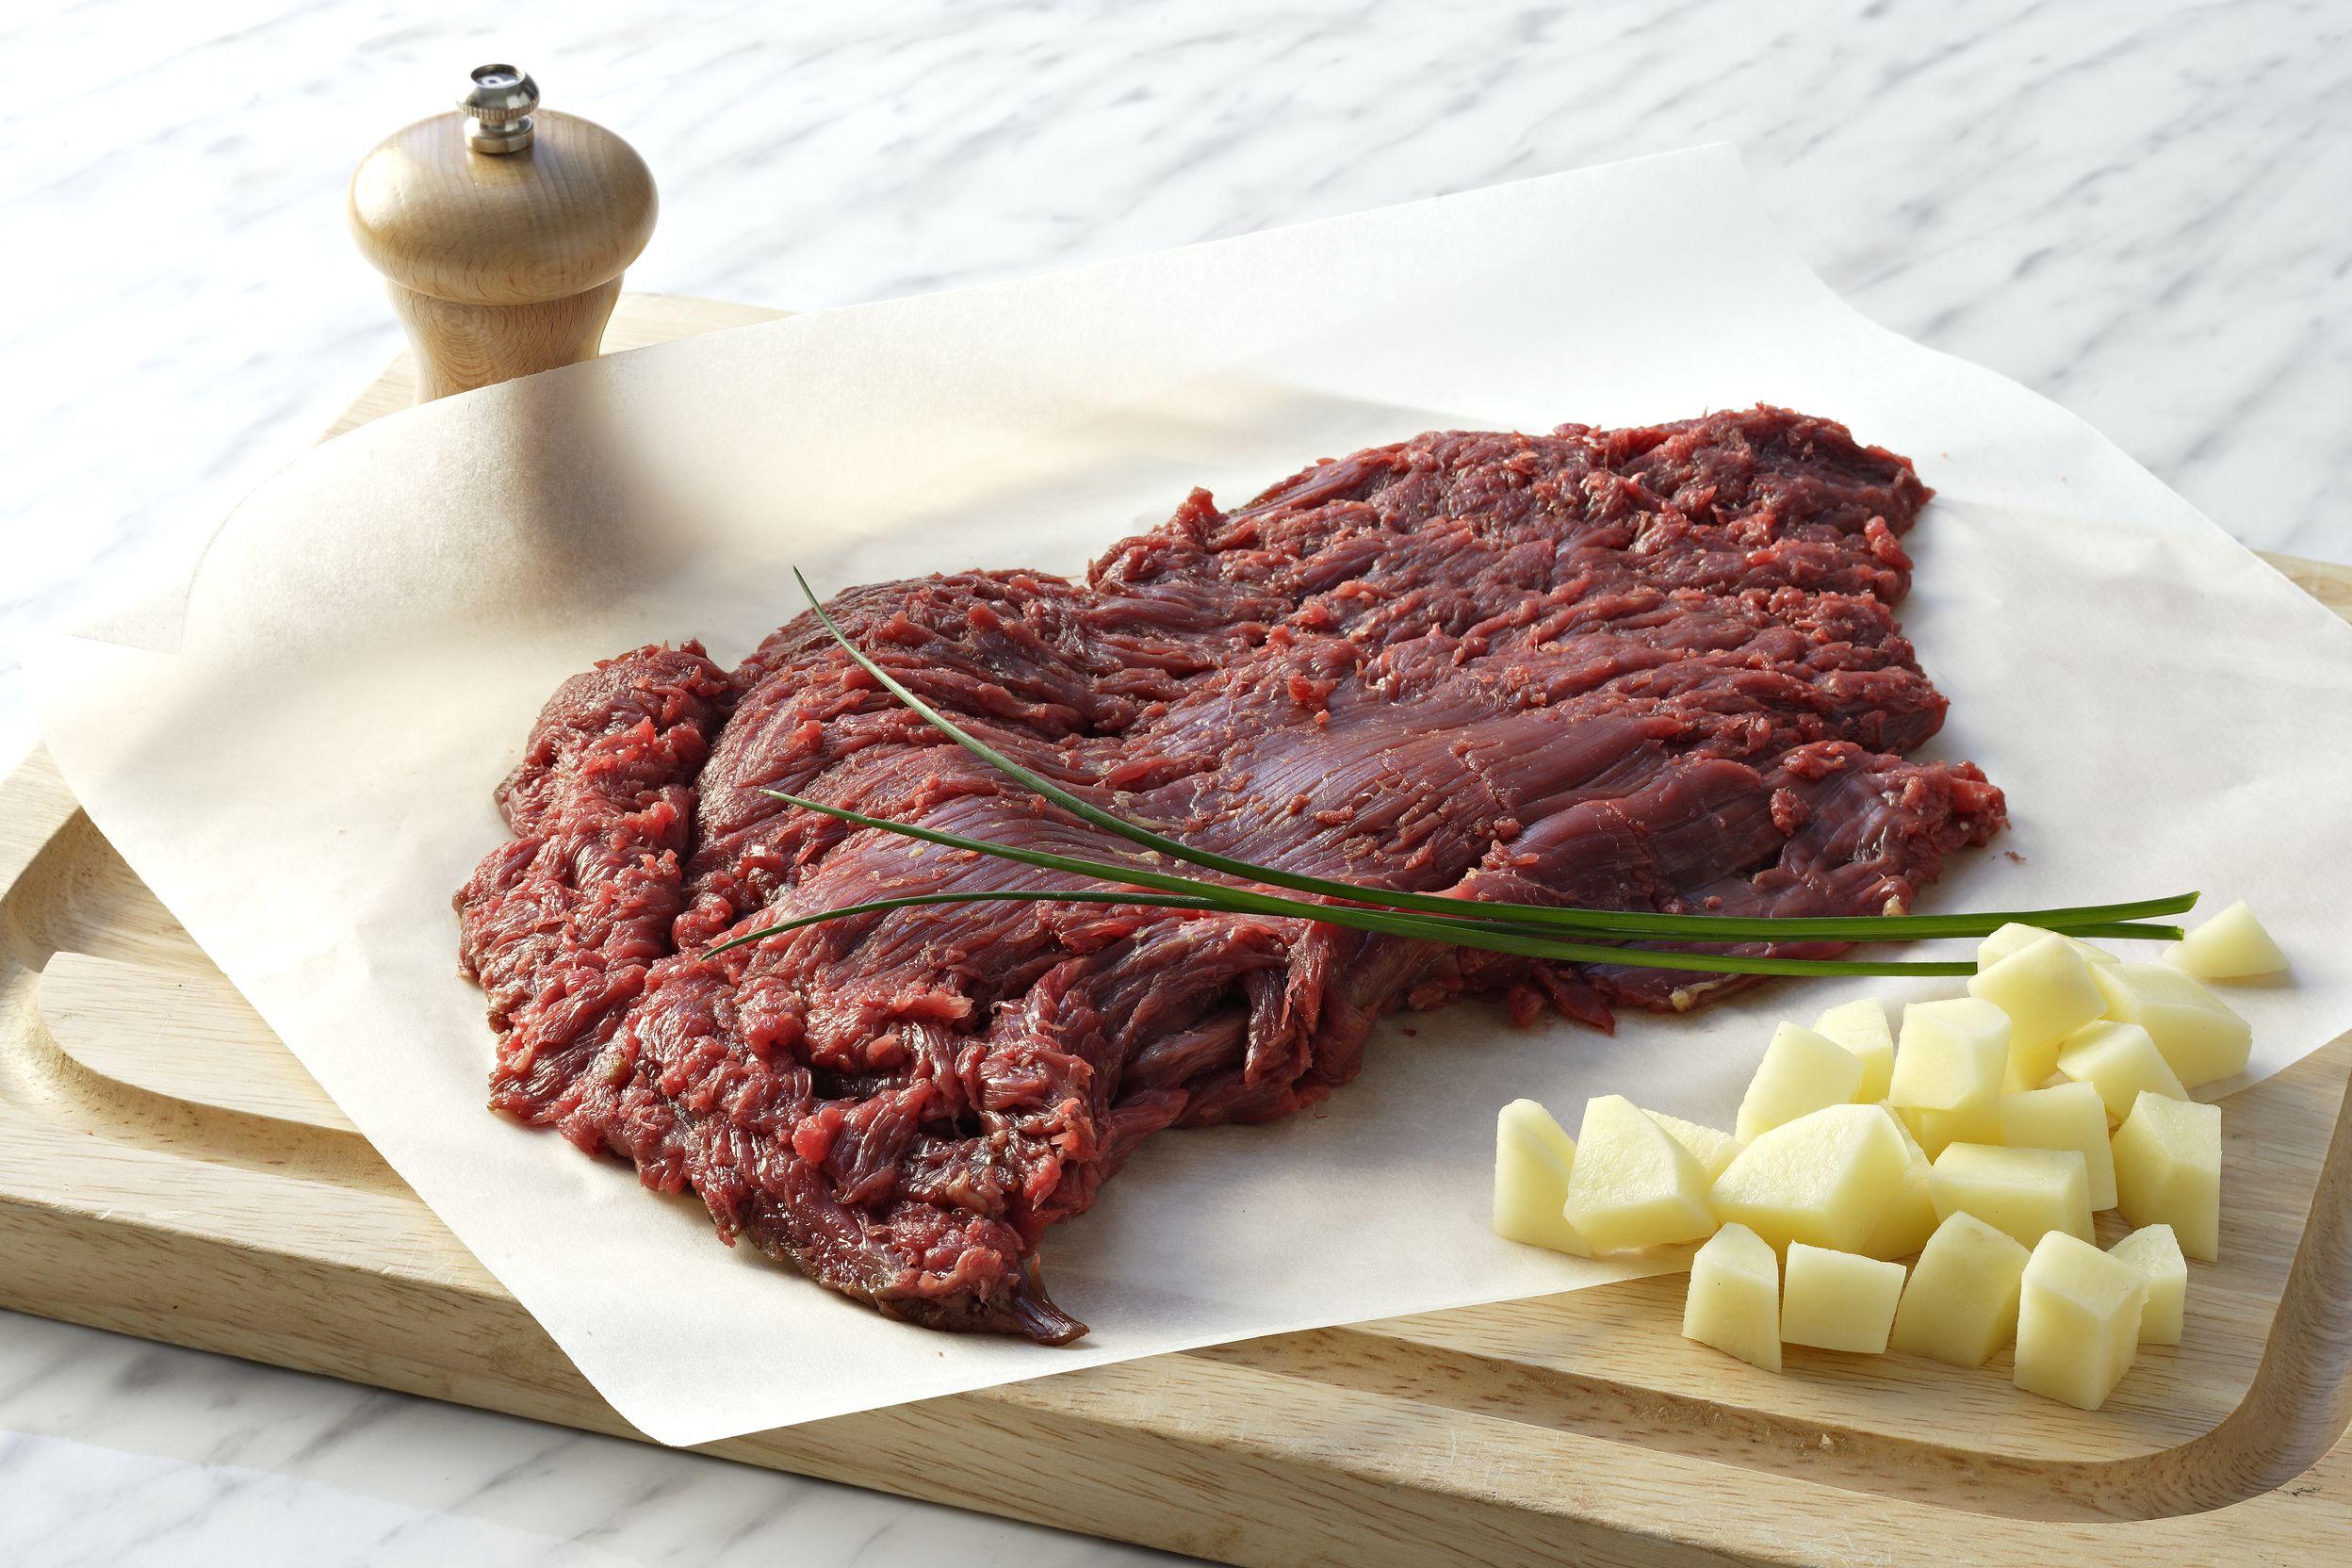 Cuisiner viande for Viande a cuisiner